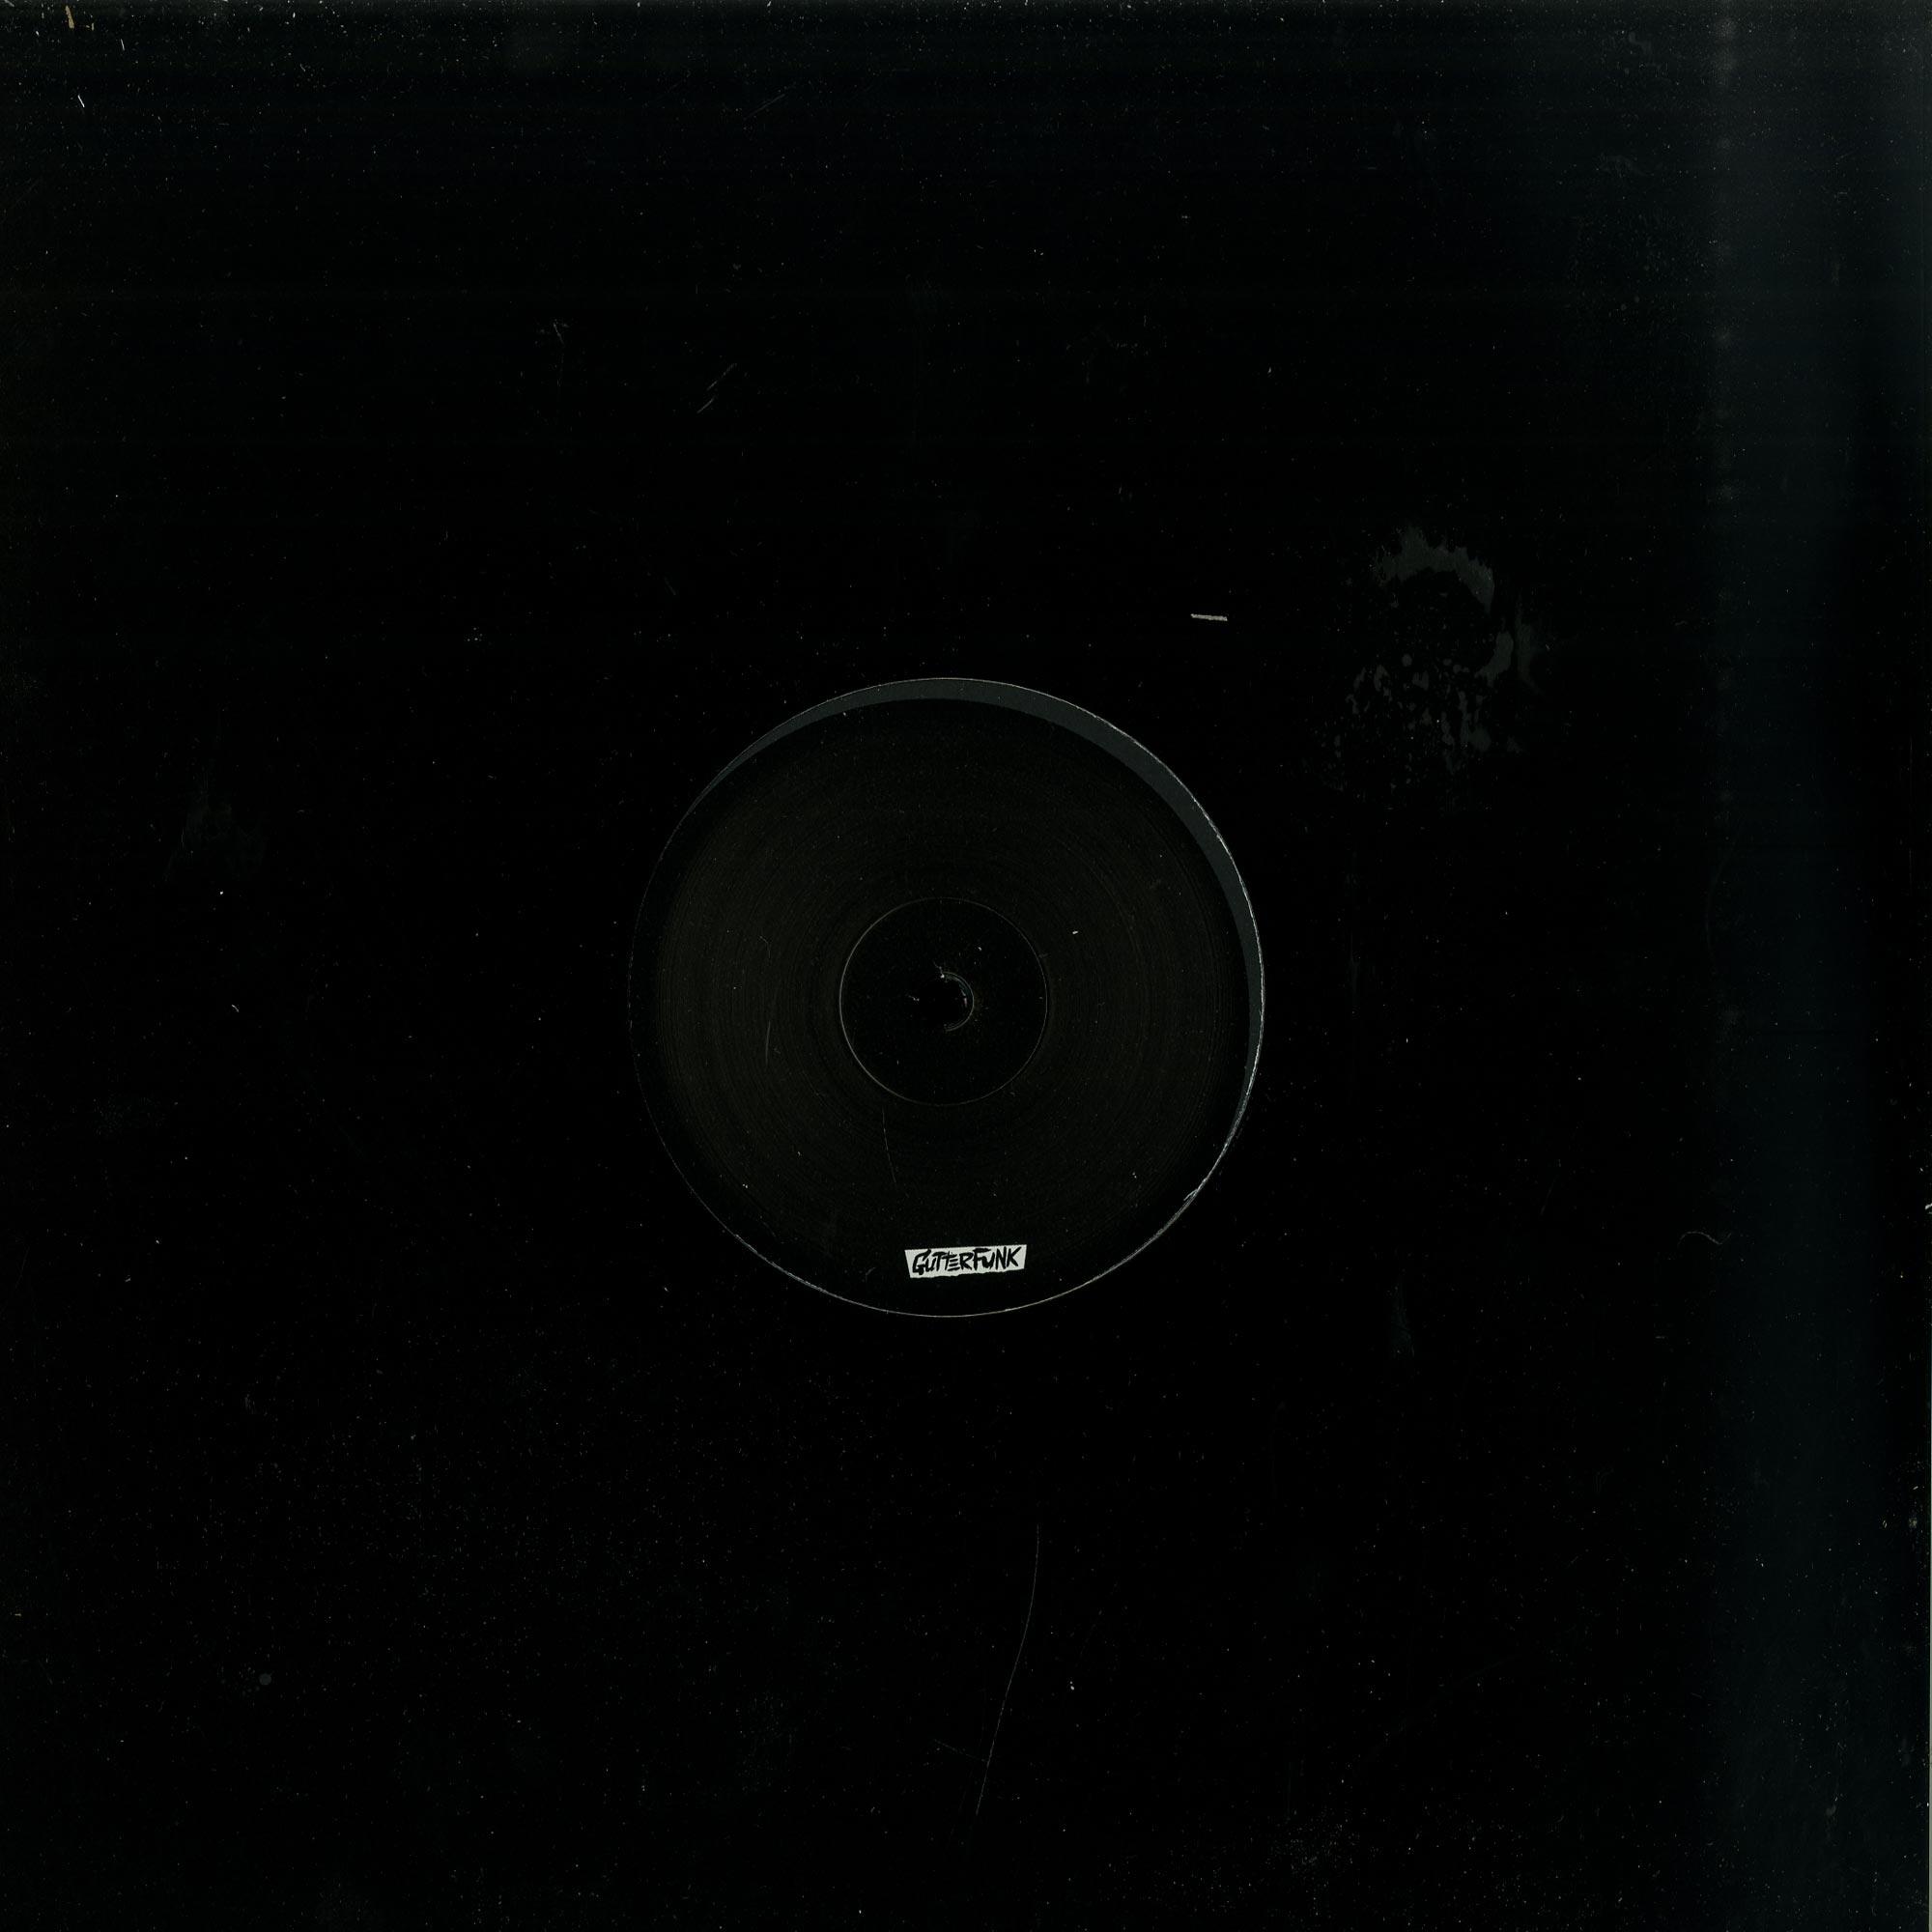 Addison Groove - BRAND NEW DROP / CATCH